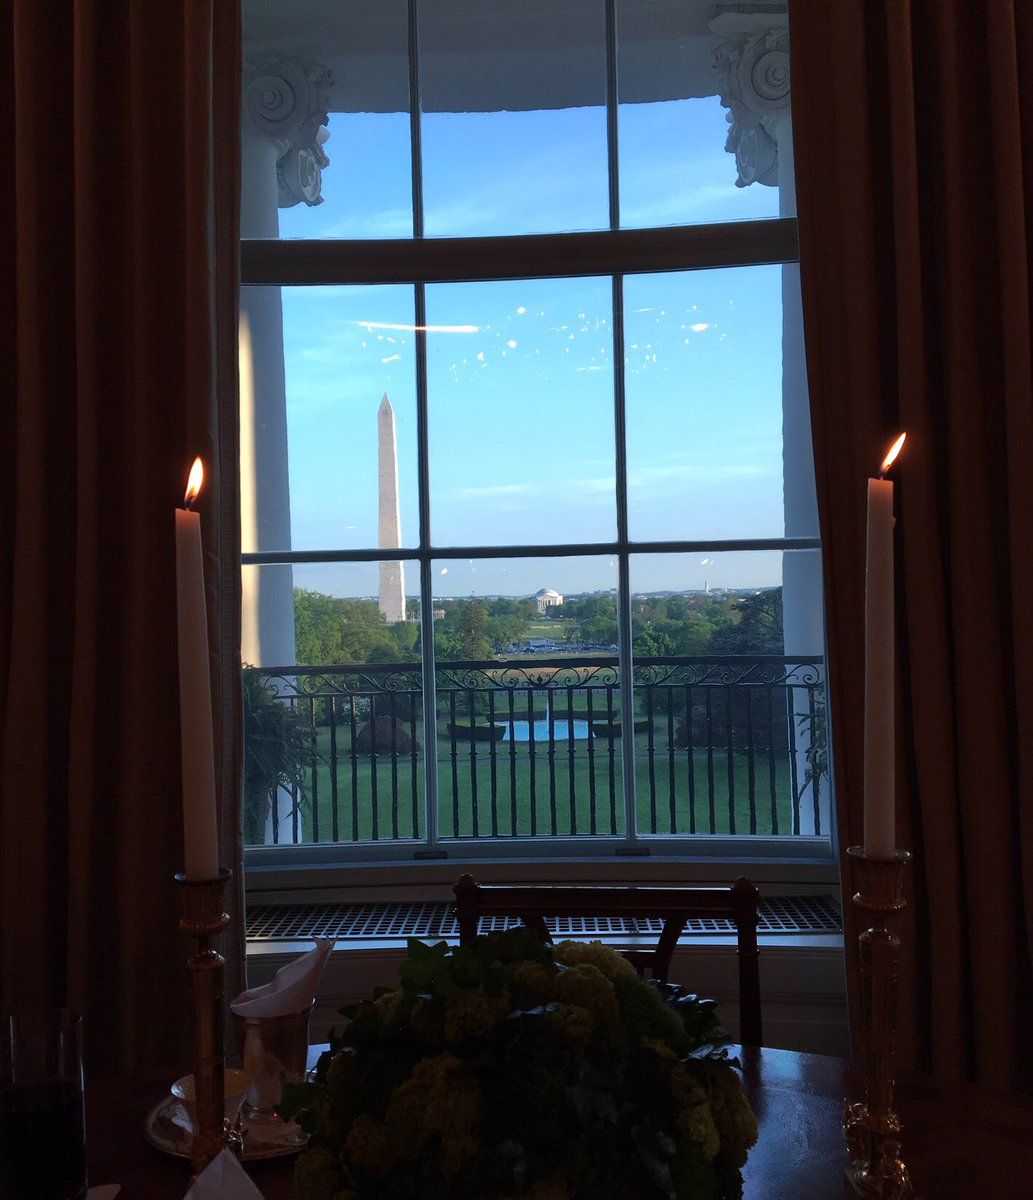 Executive Privilege And The Obama Nixon Transformation: DDT: Week Twenty-One, Any Success Elusive